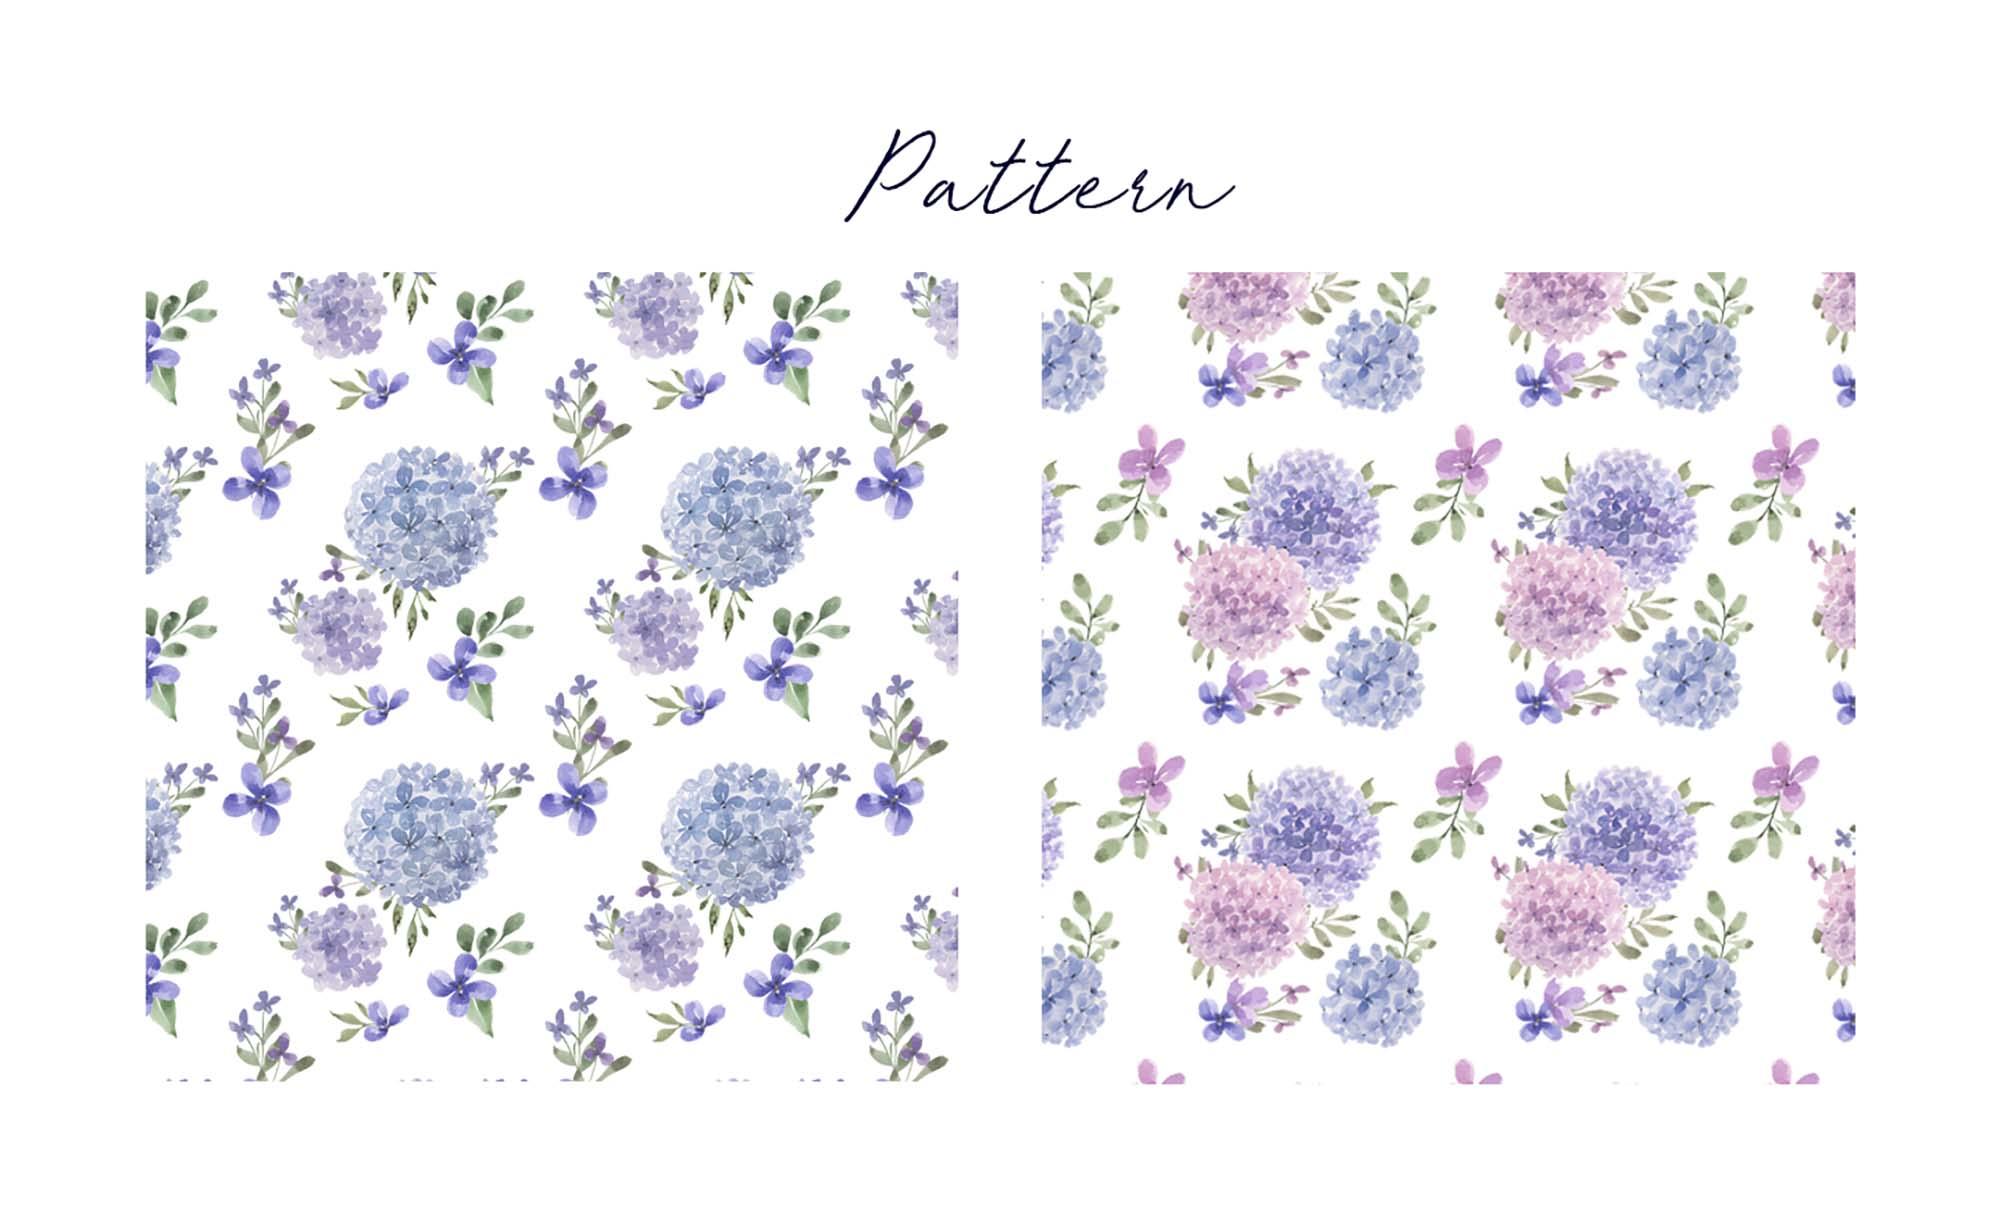 Hydrangea Watercolor Design Elements 5